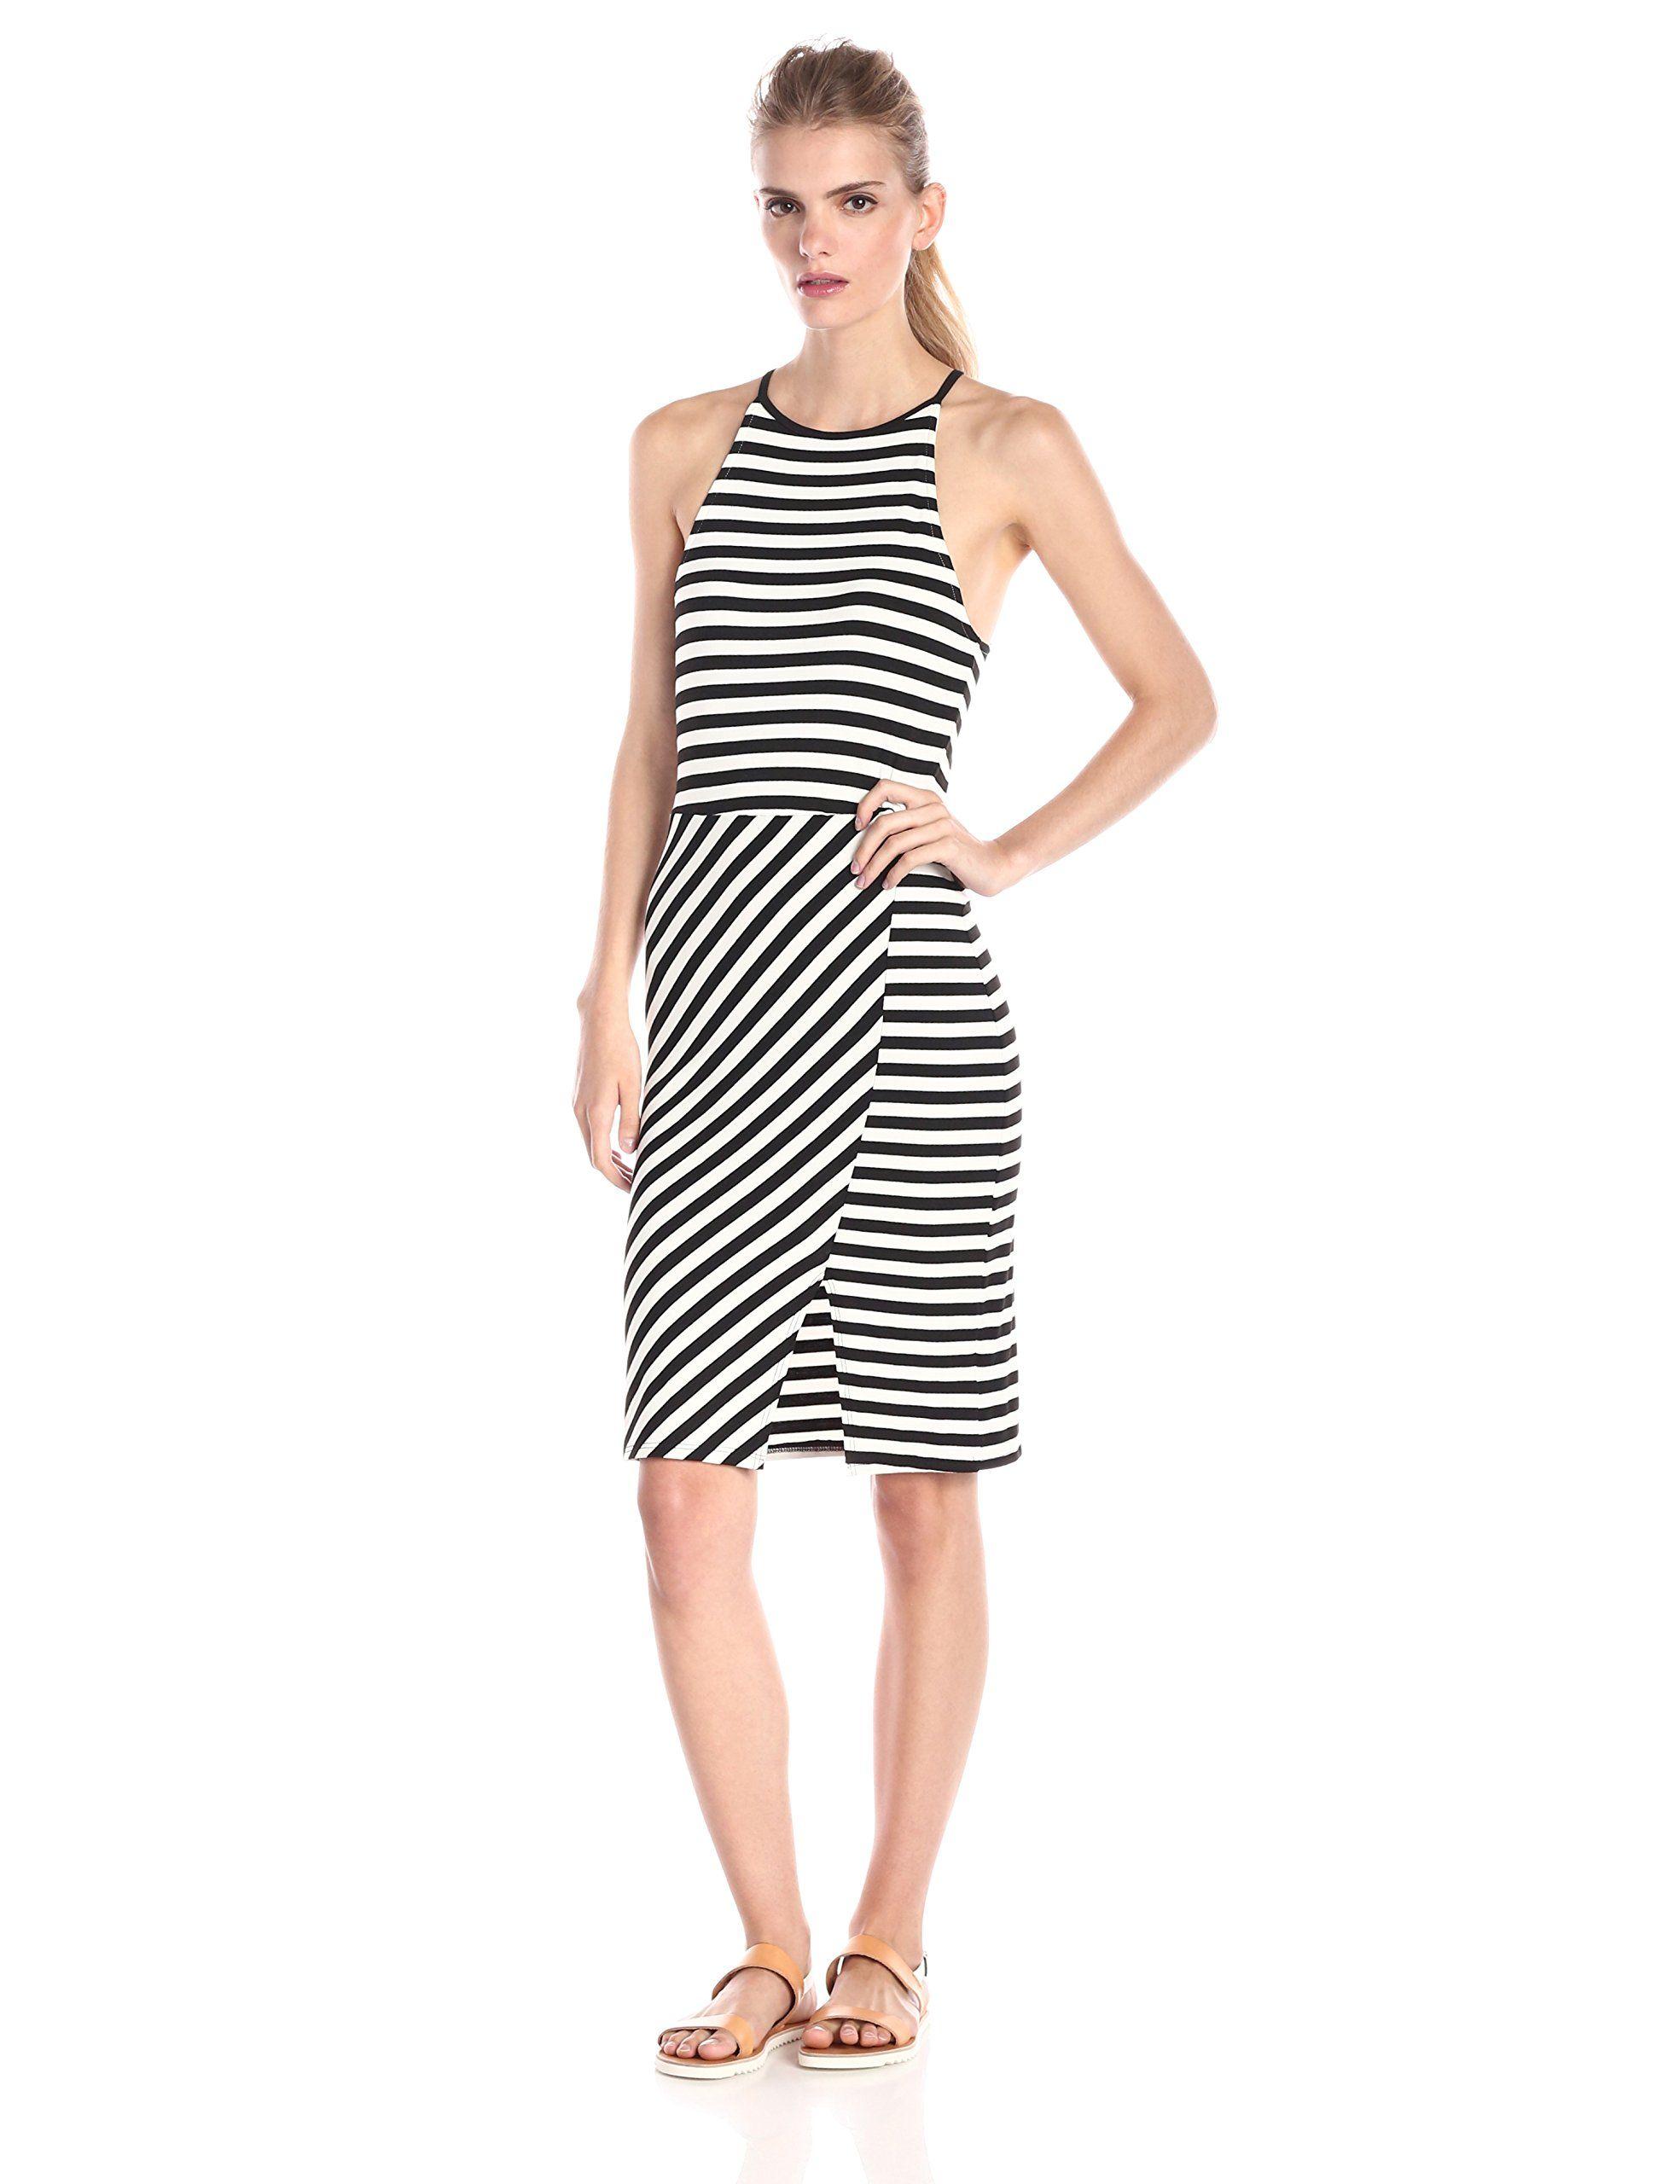 364f52f60f6 Where To Buy Nice Dresses In Manila - Gomes Weine AG